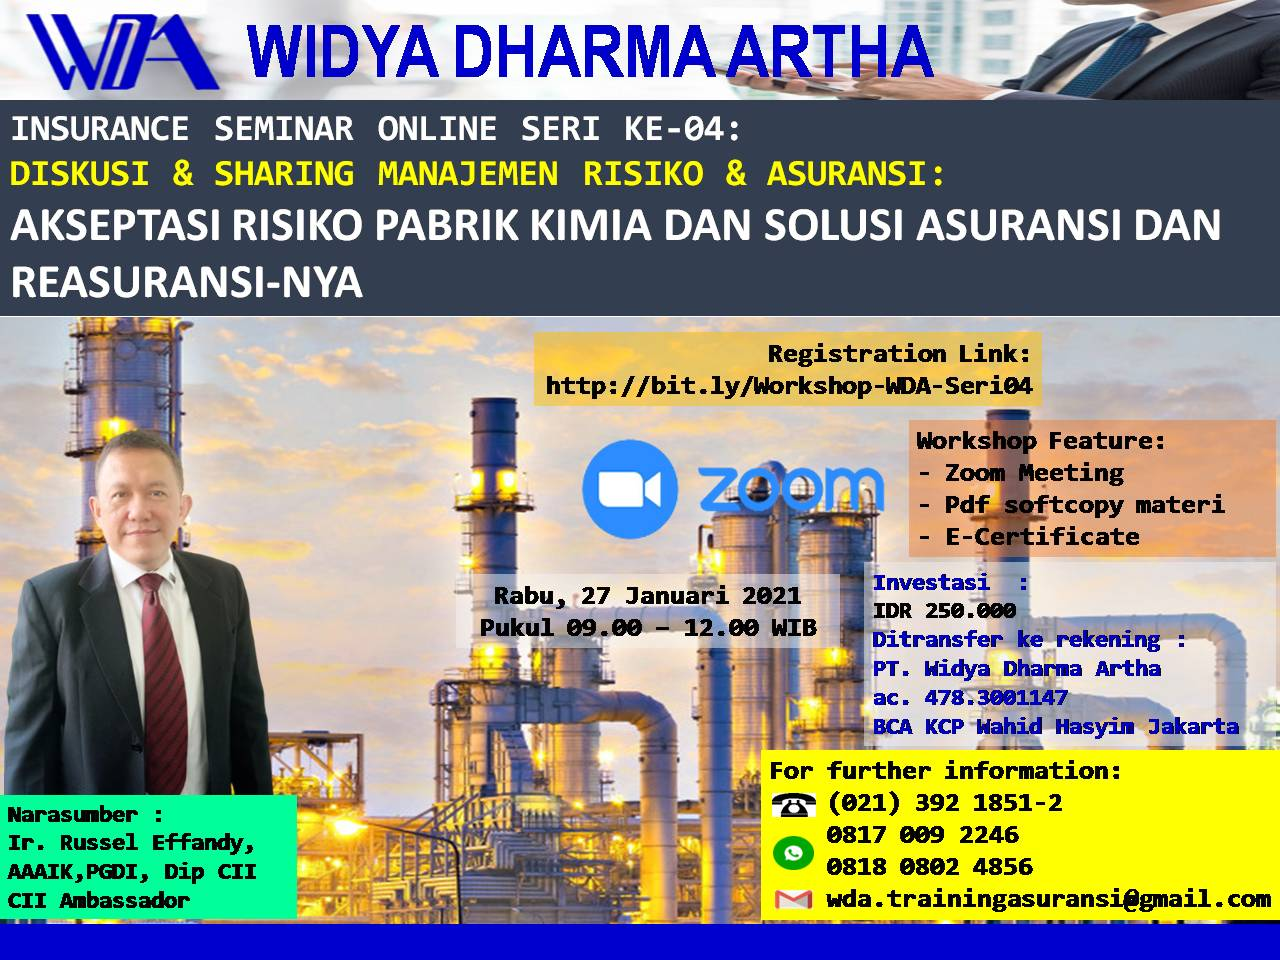 wda-chemicalrisk-270121